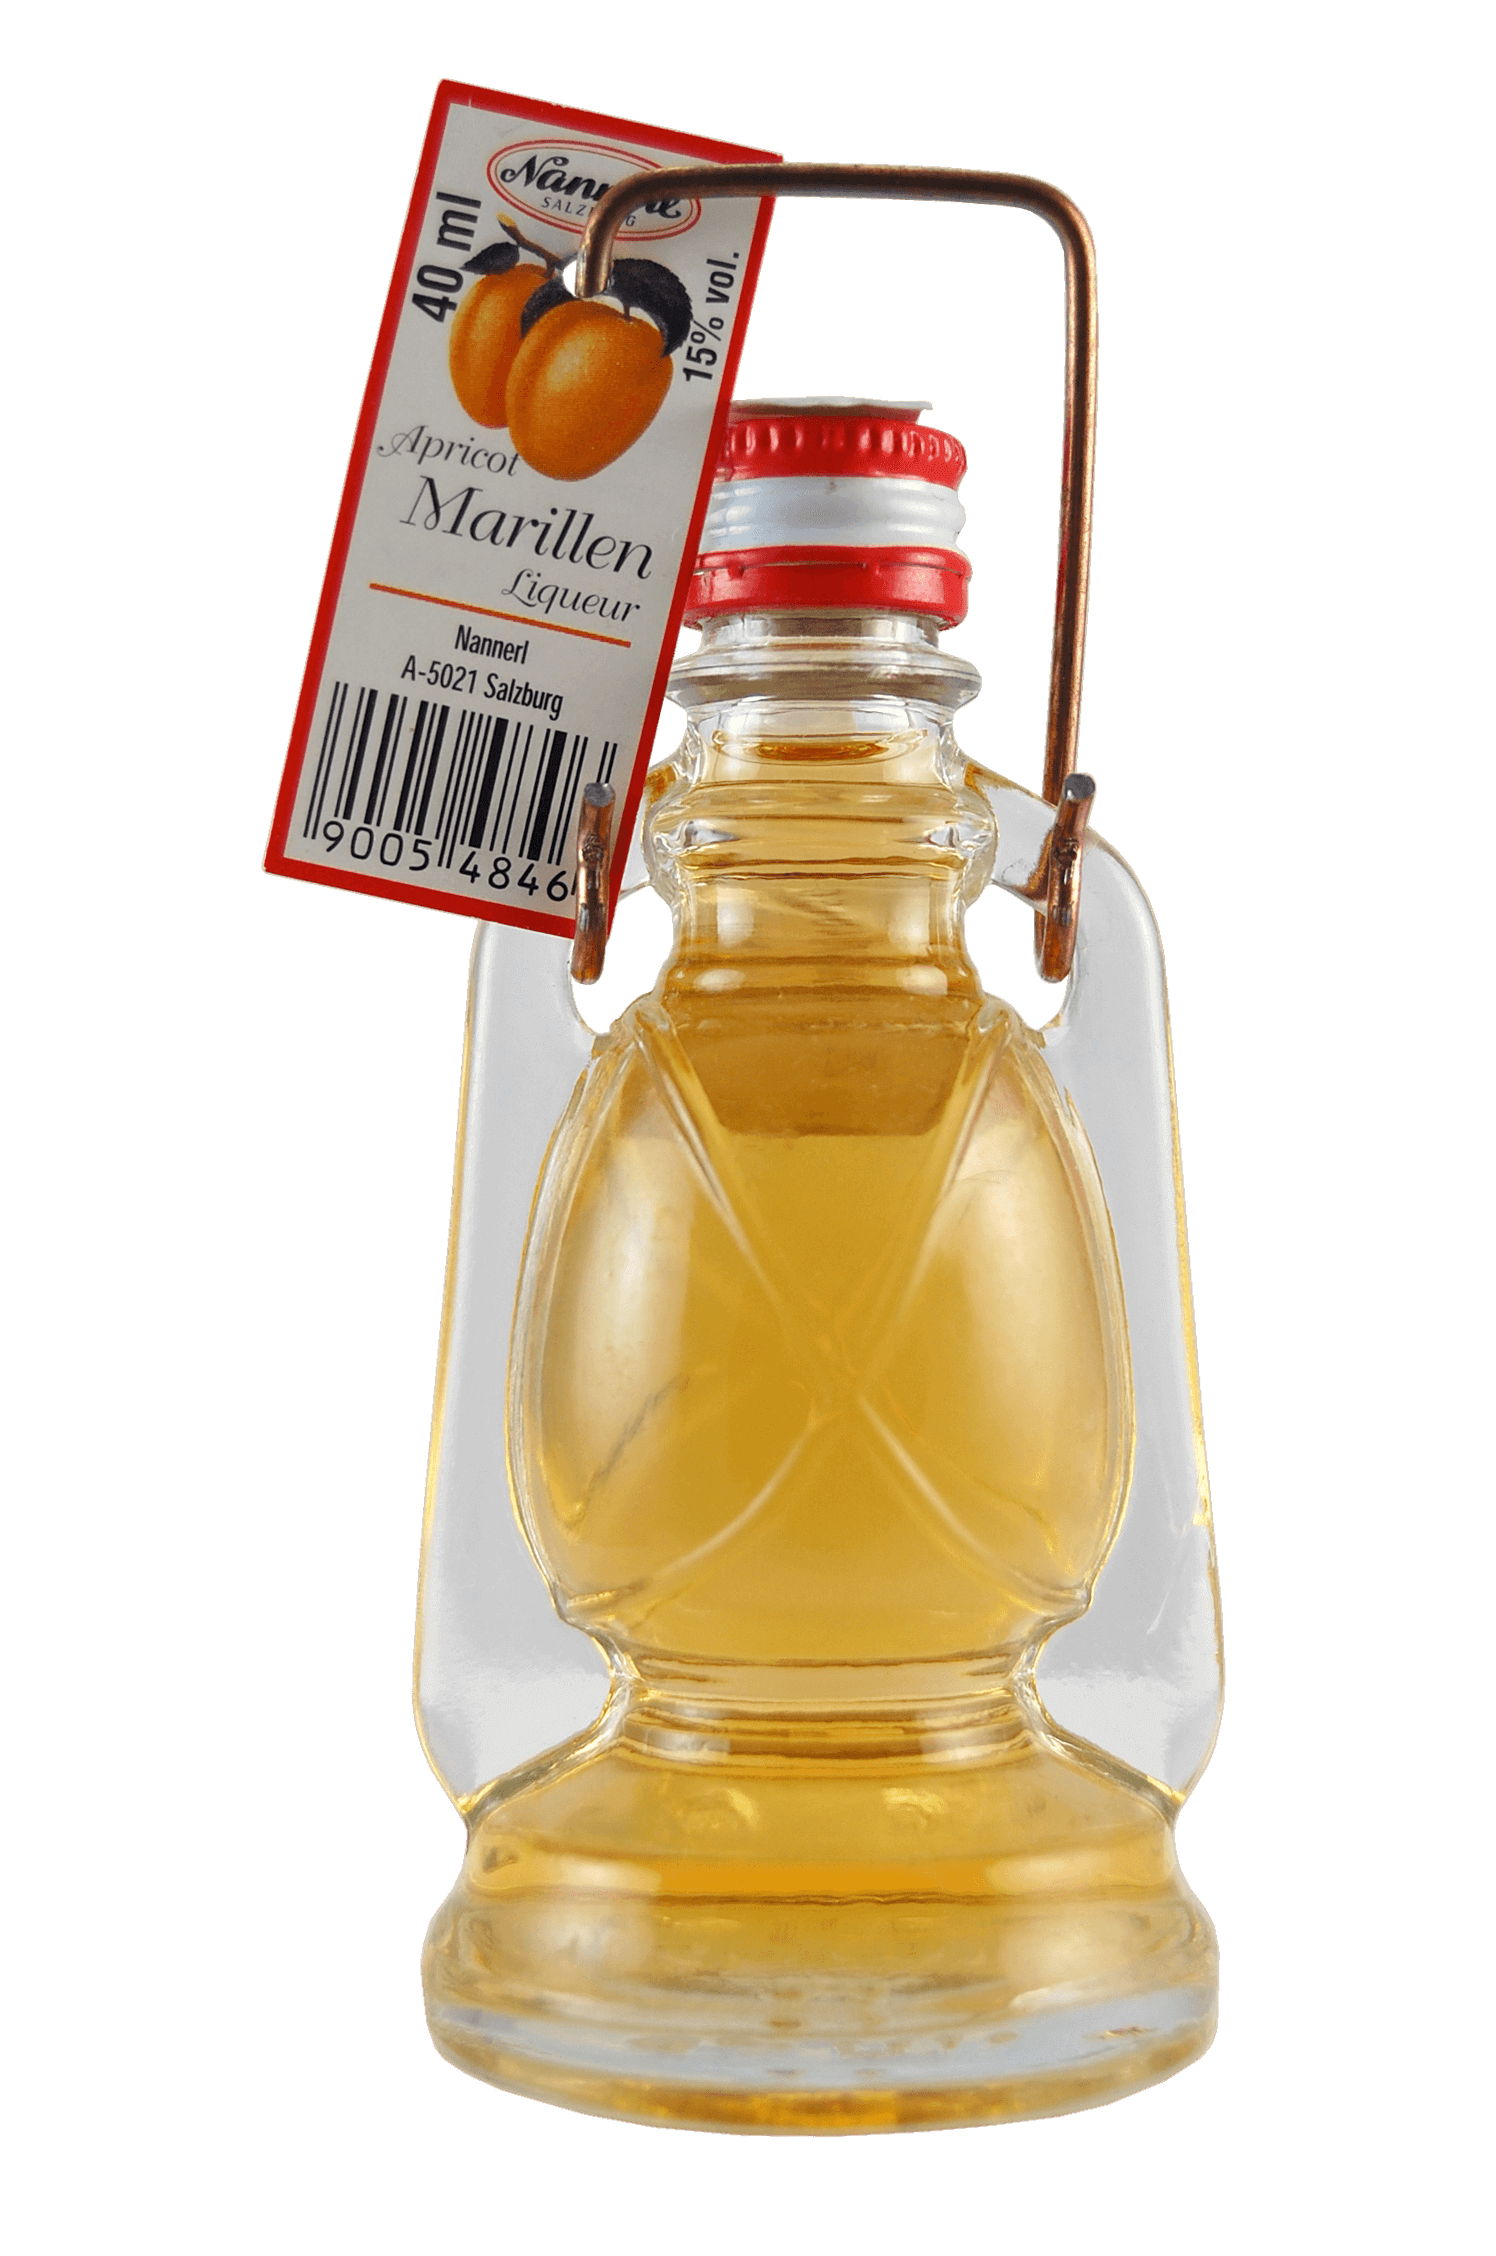 Apricot Marillen Liqueur